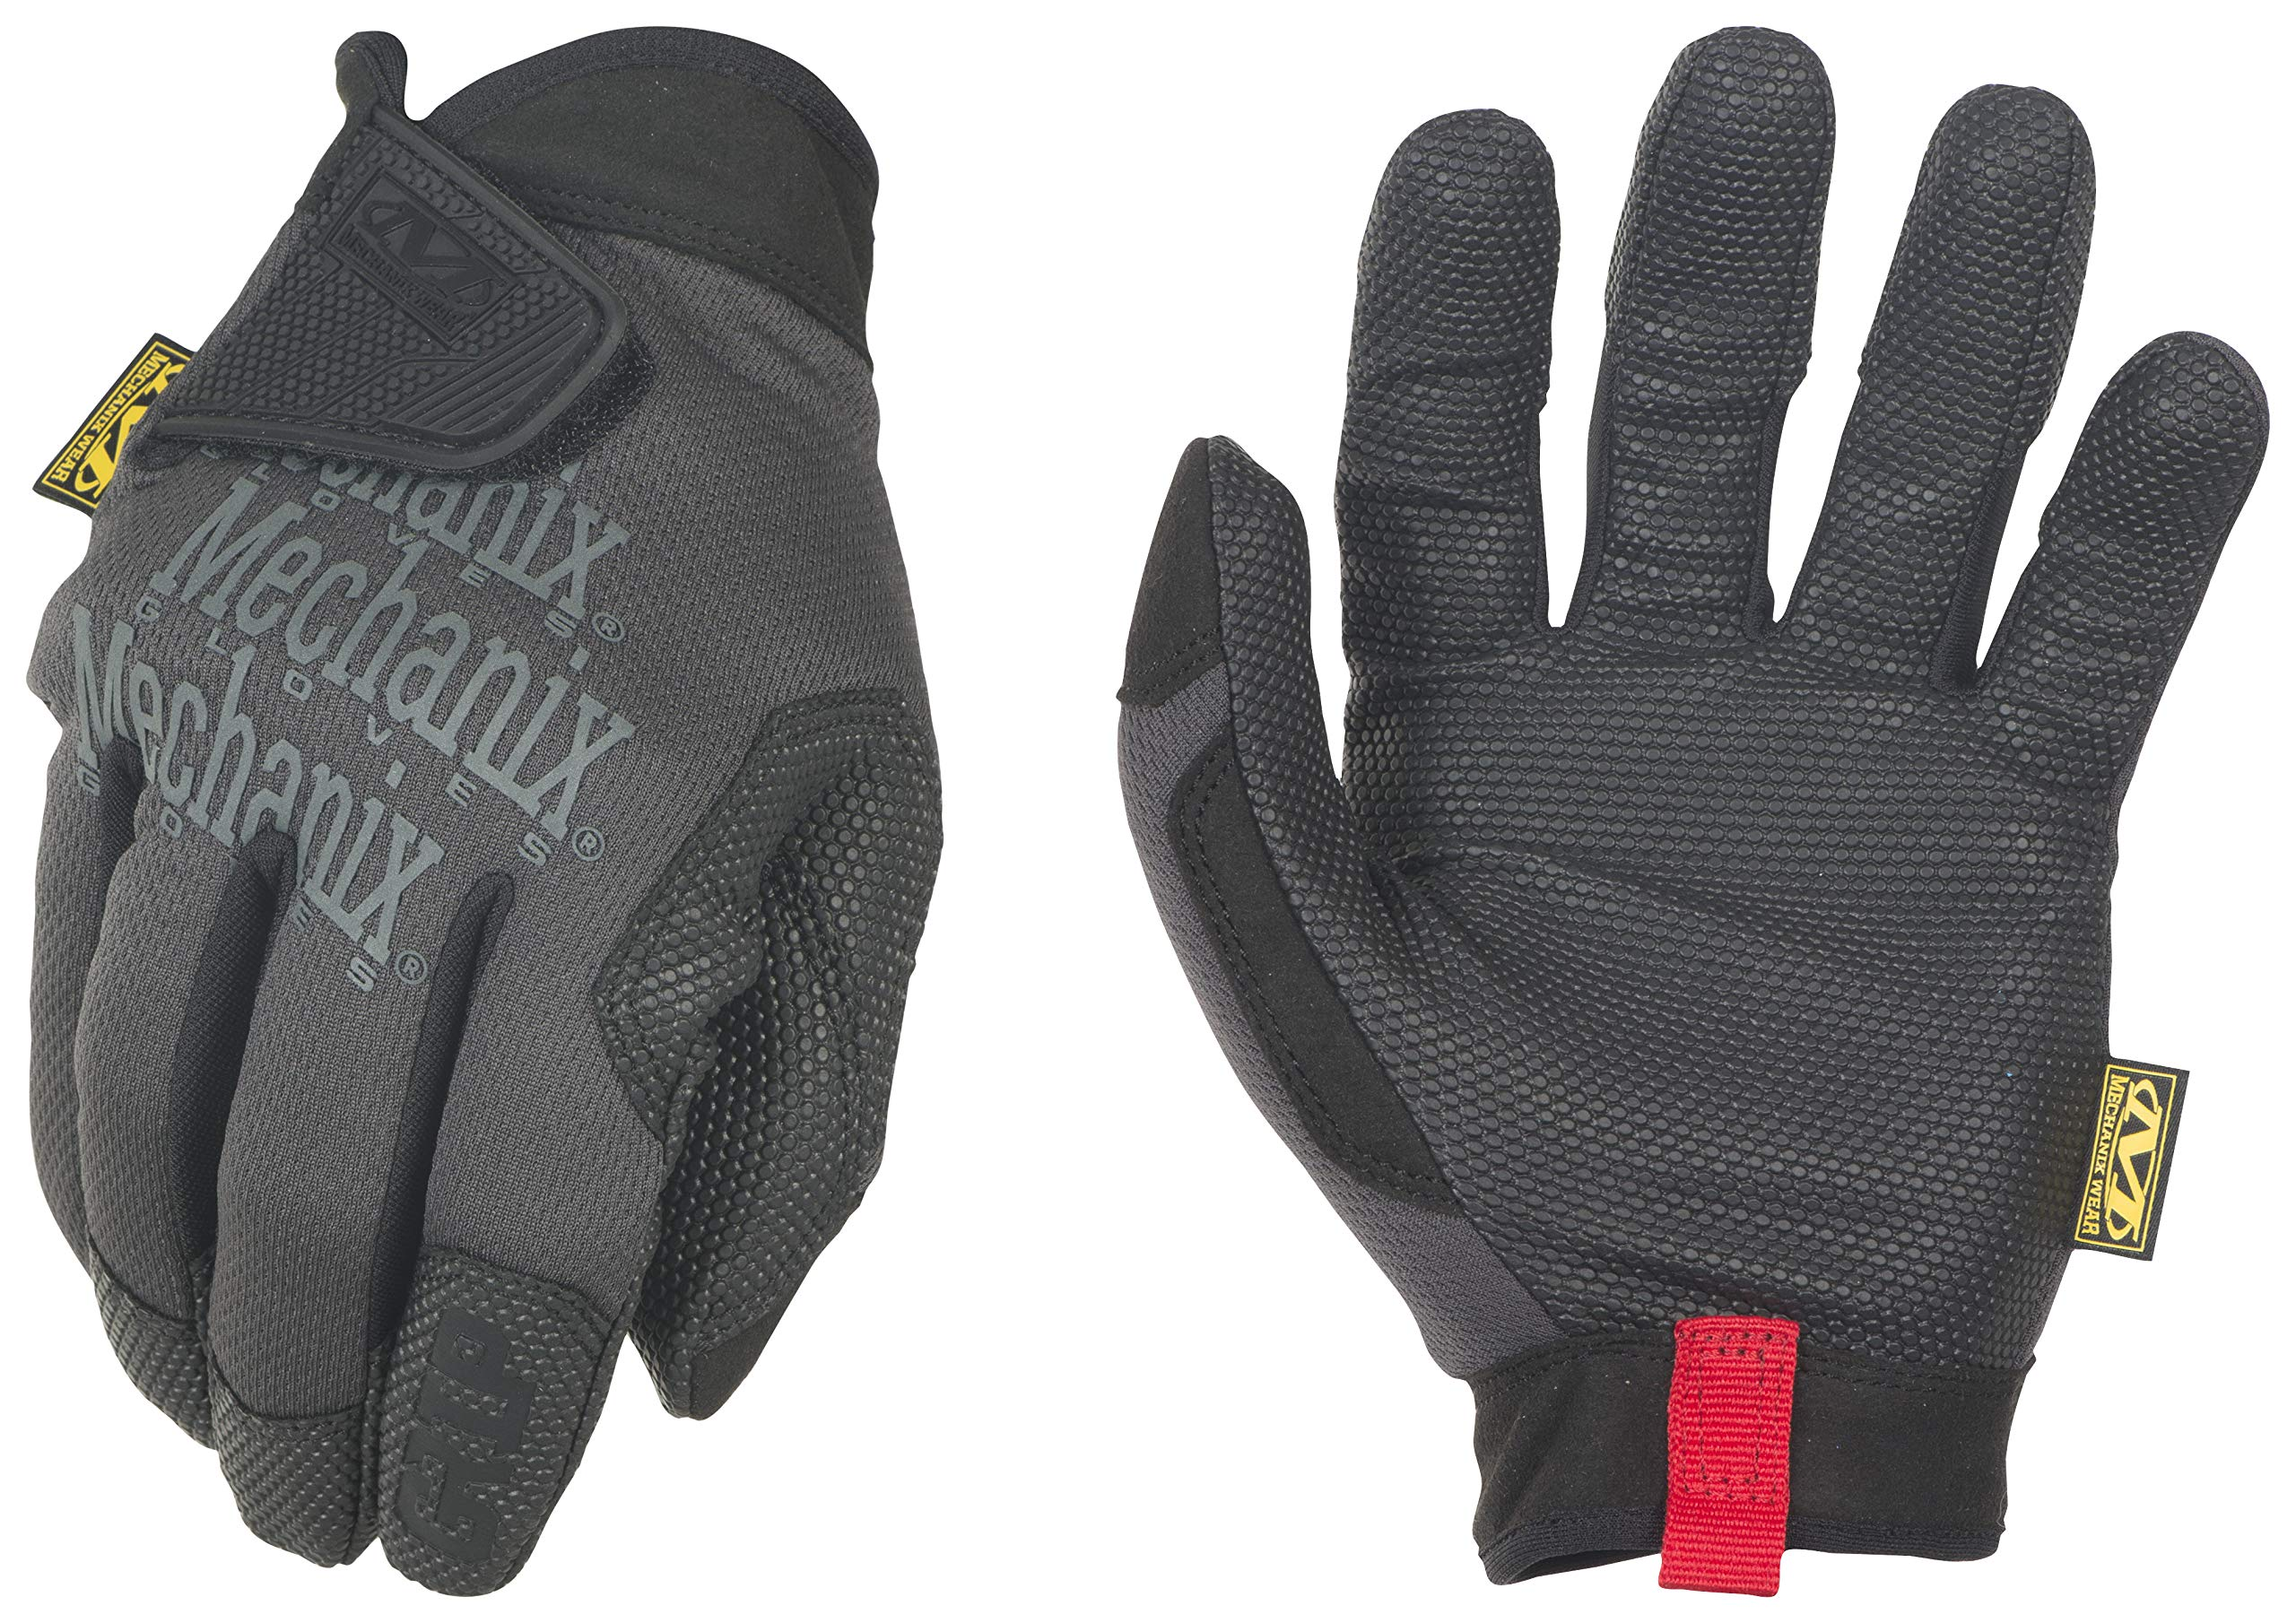 Mechanix Wear: Specialty Grip Work Gloves (Small, Black/Grey)